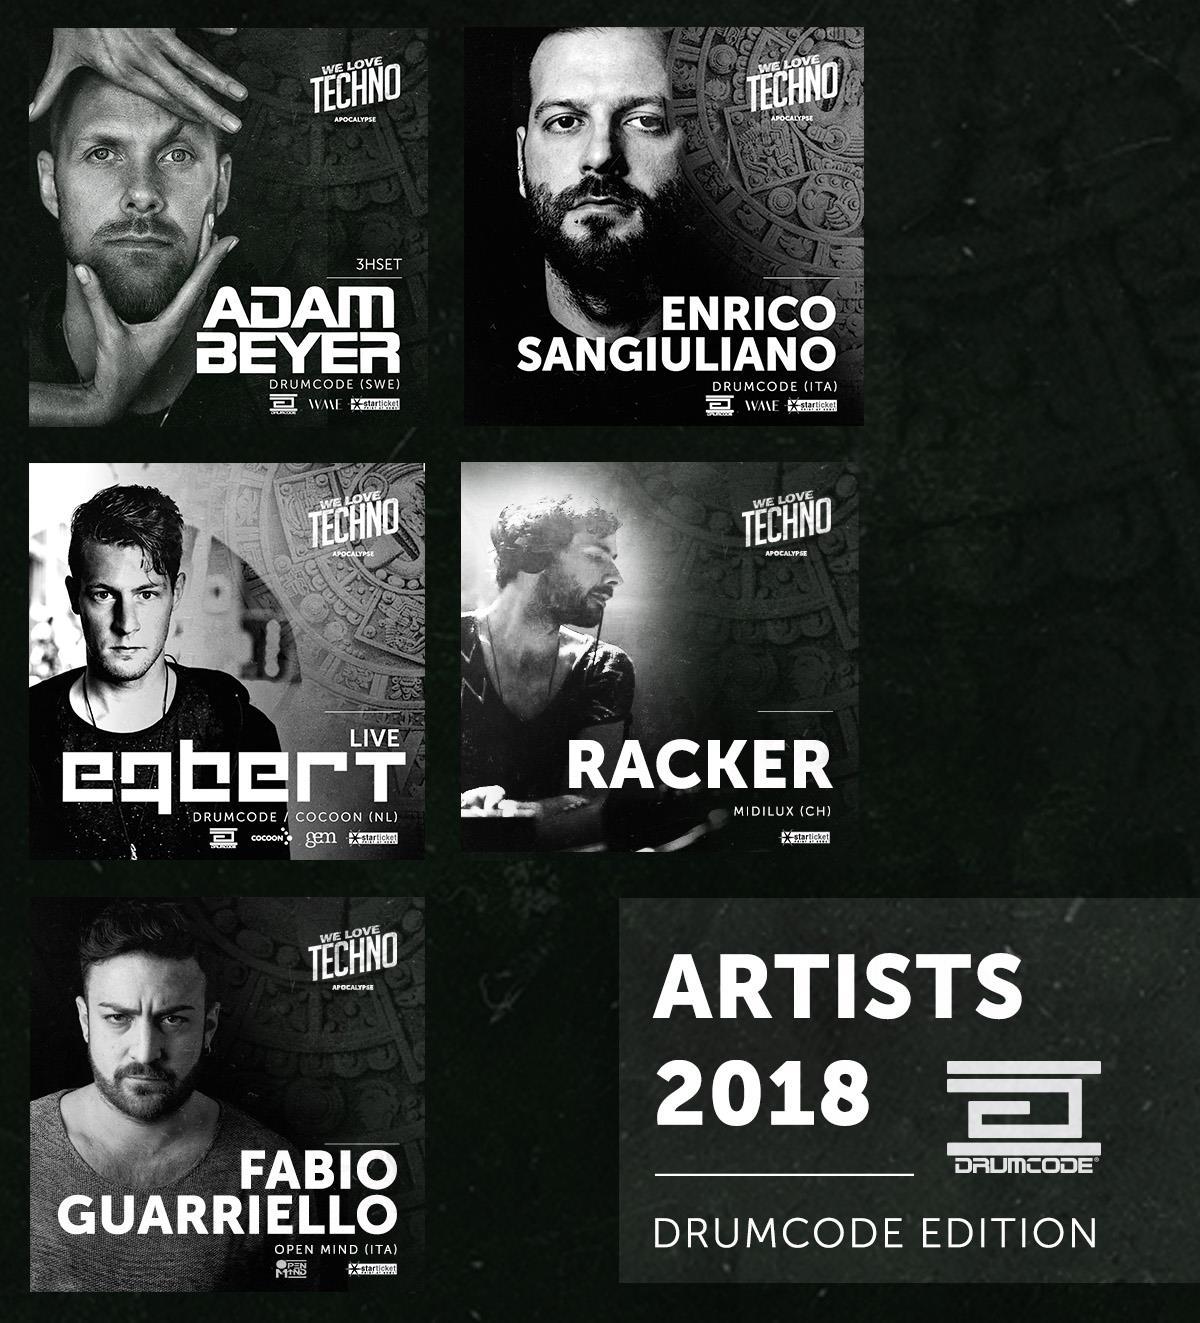 Drumcode Edition - We Love Techno